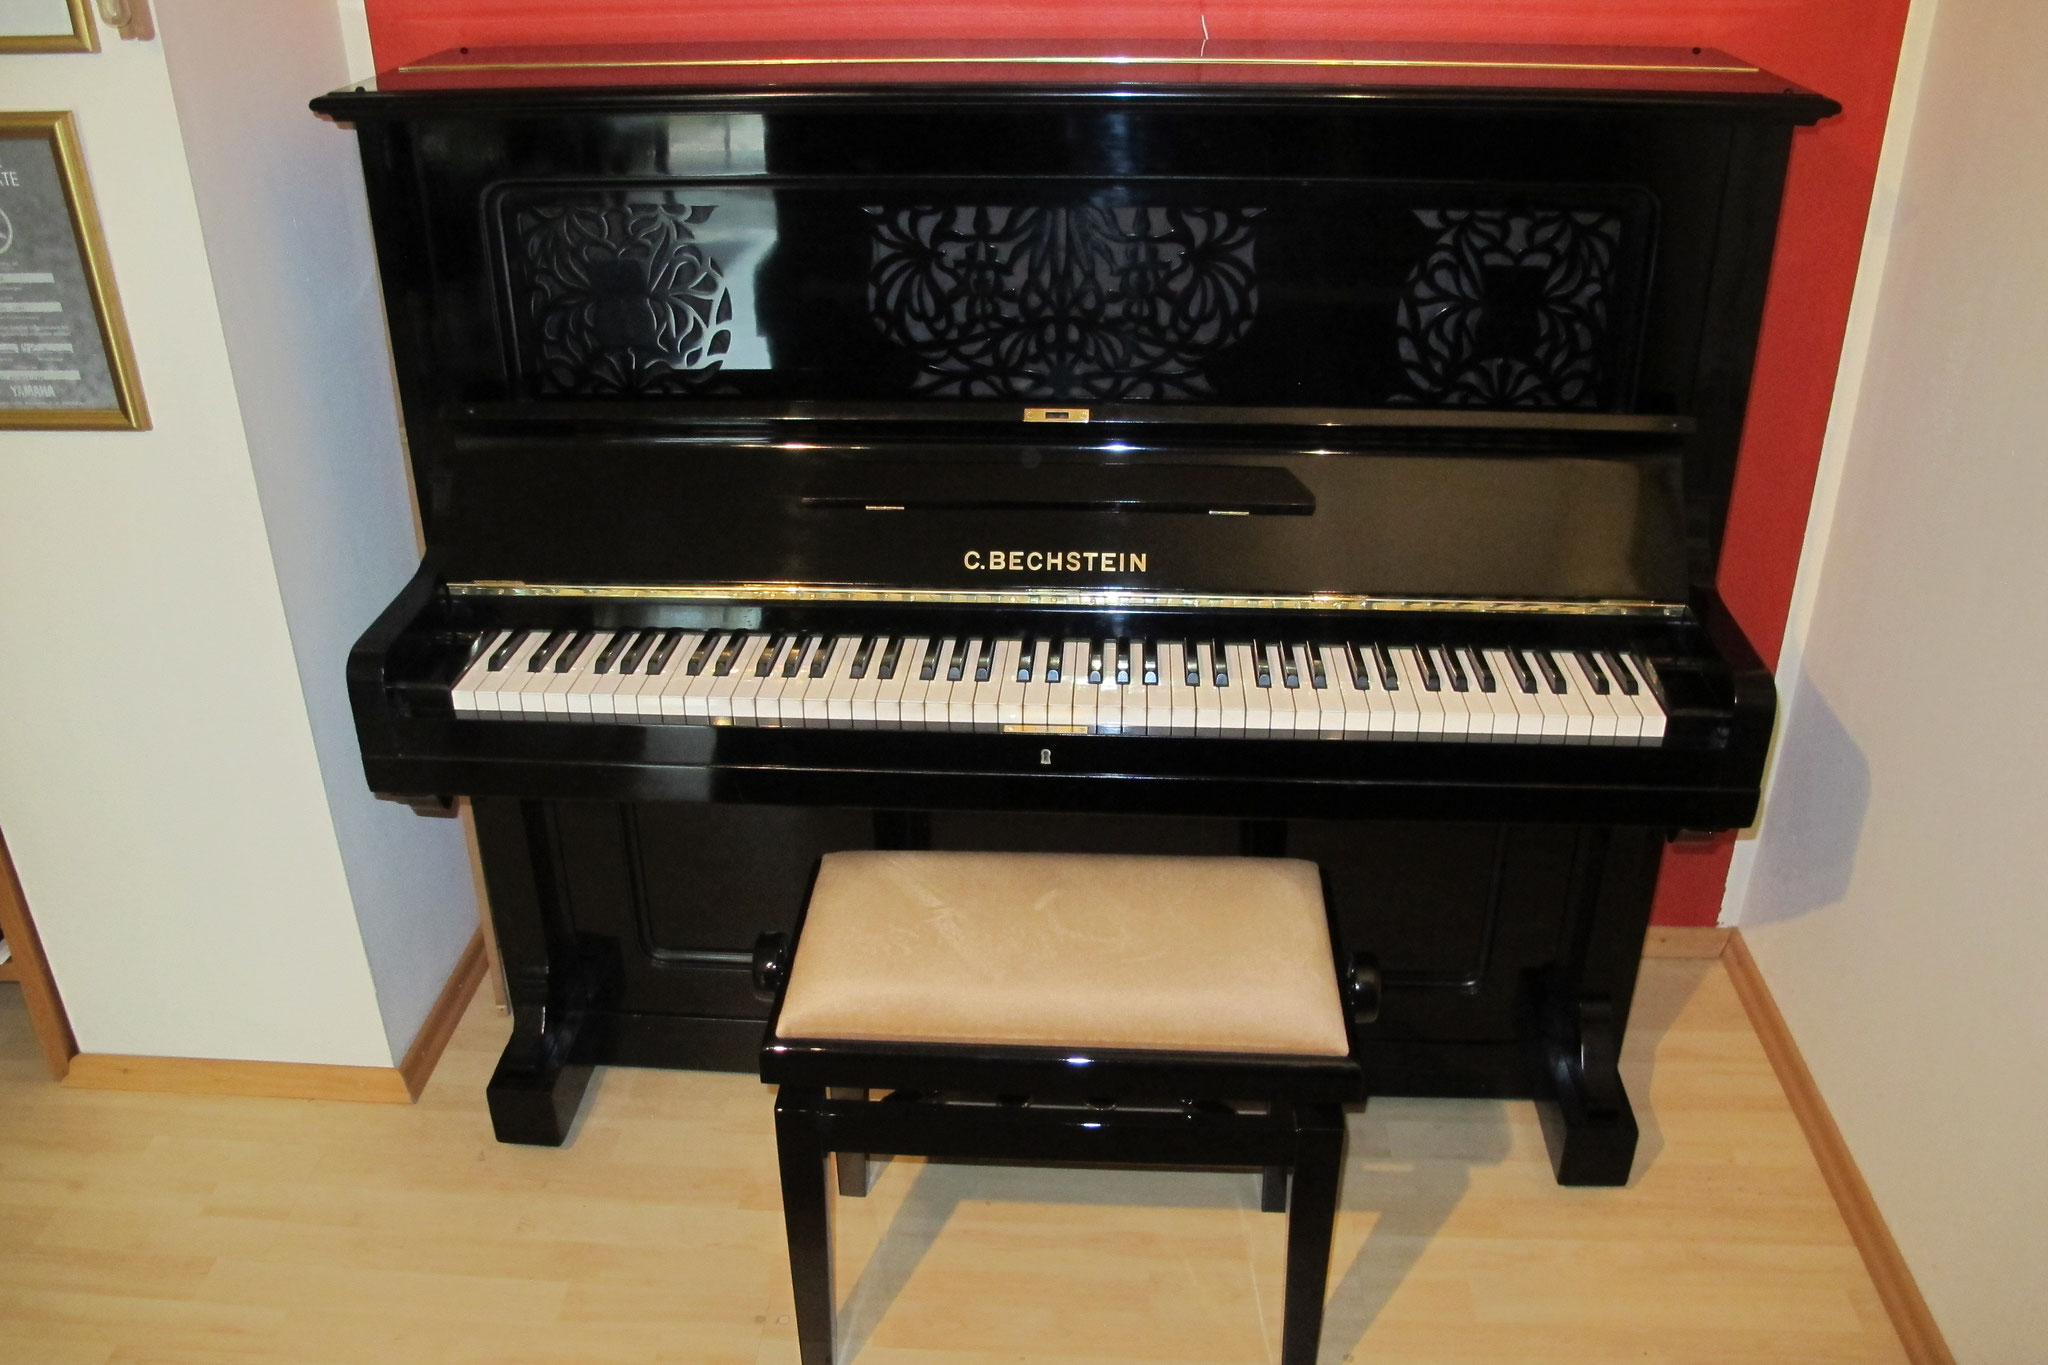 Piano C. Bechstein, Modell V